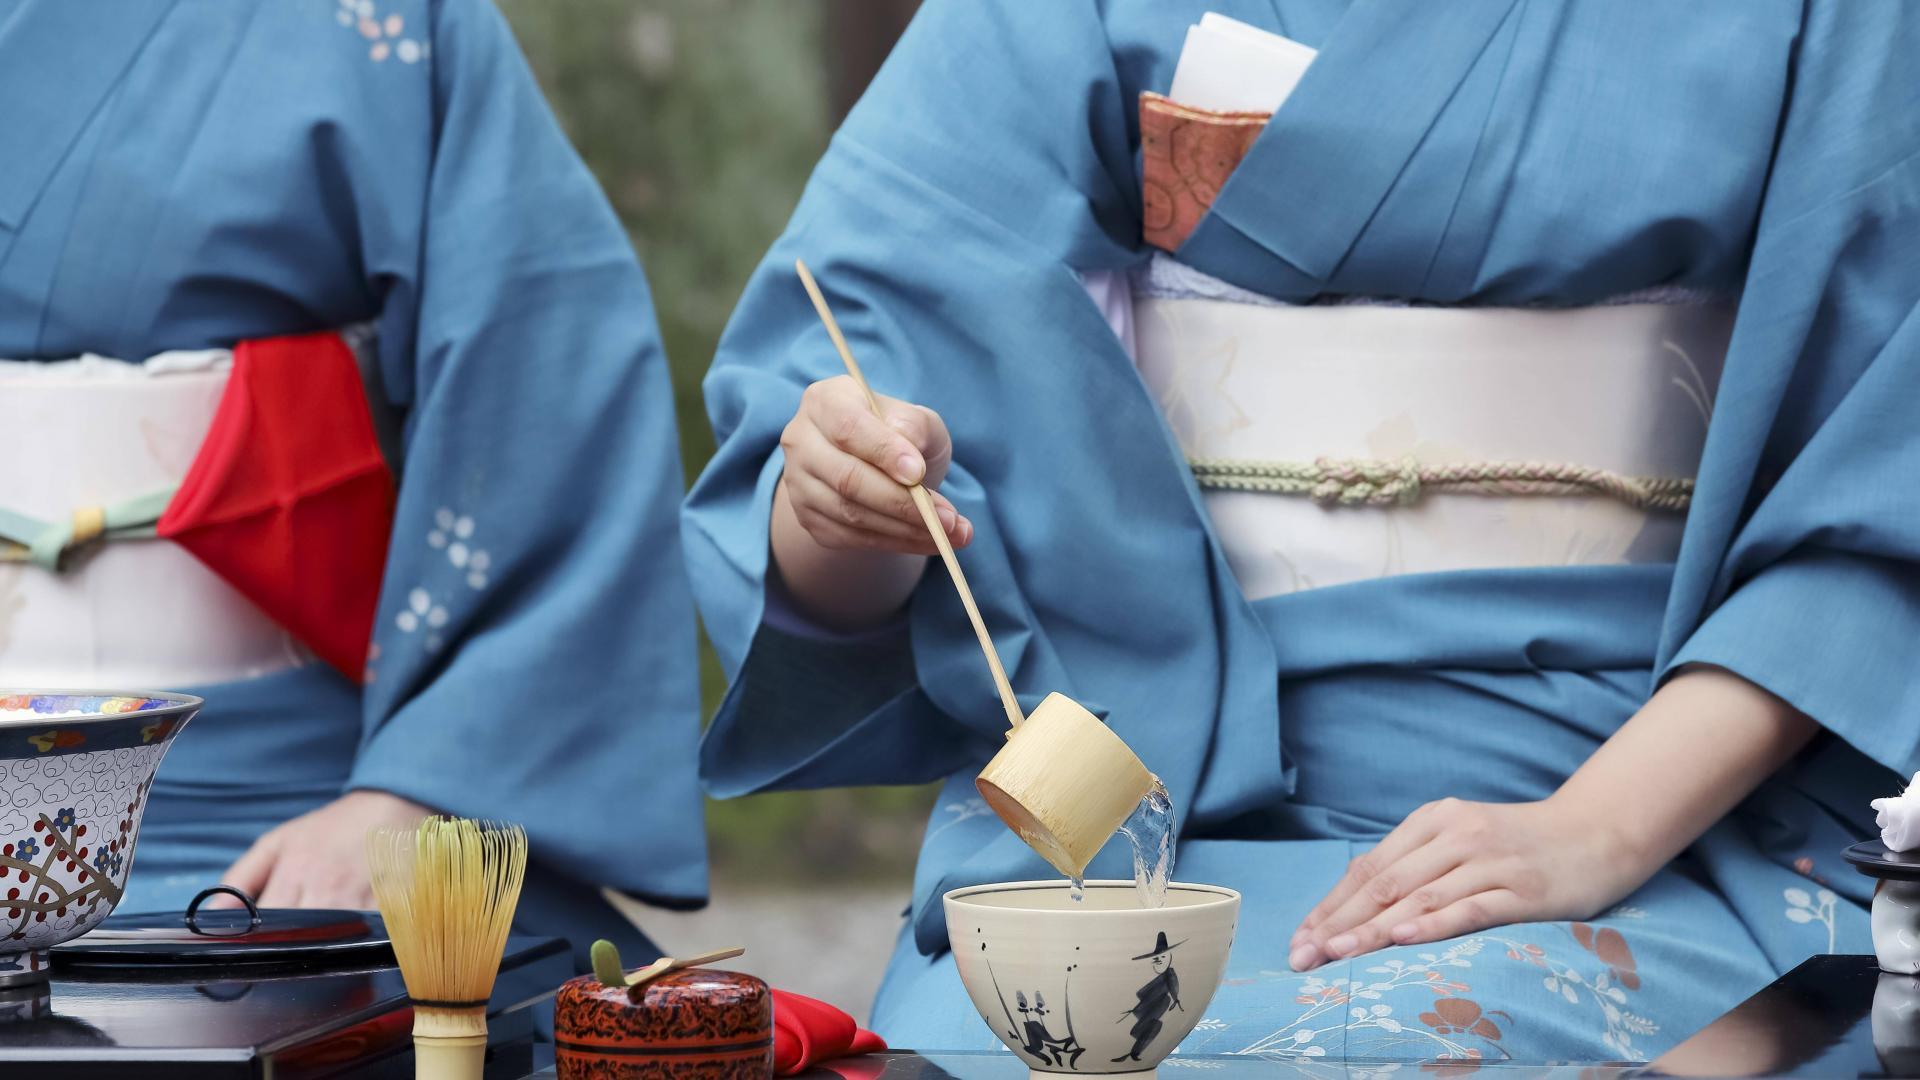 Japan, Japanische Tradition, Kimono, Teezeremonie, Japanische Ernährung